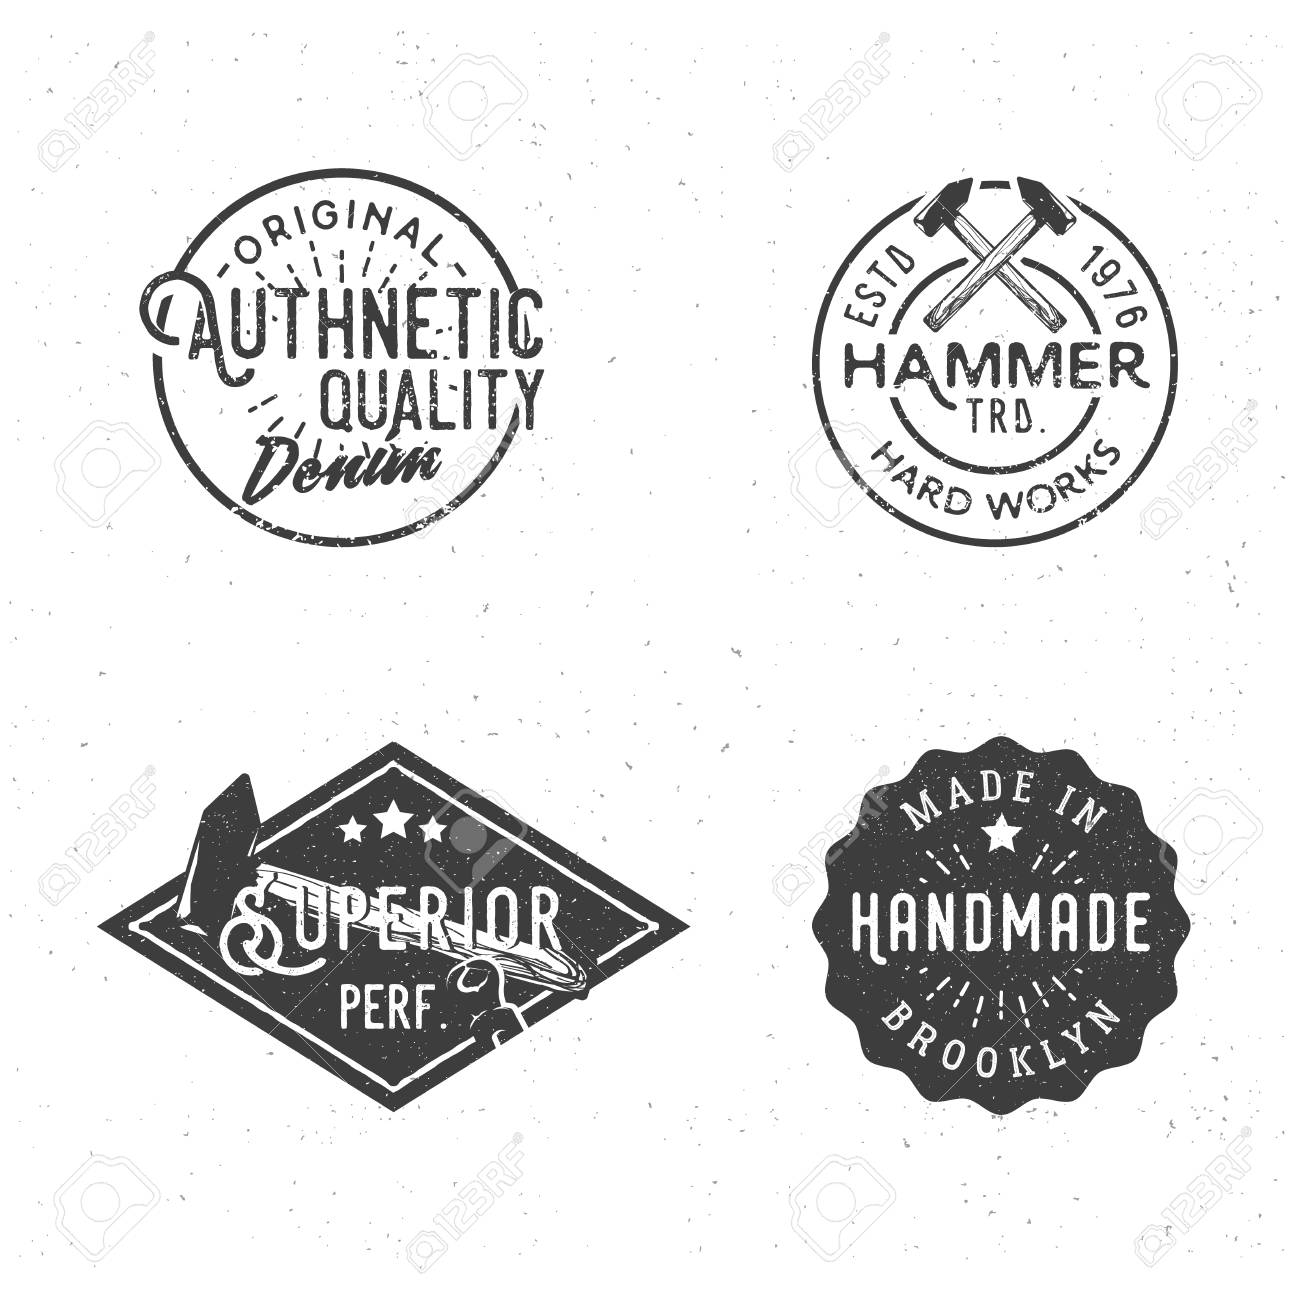 vintage logotypes in retro old fashioned style vintage logo